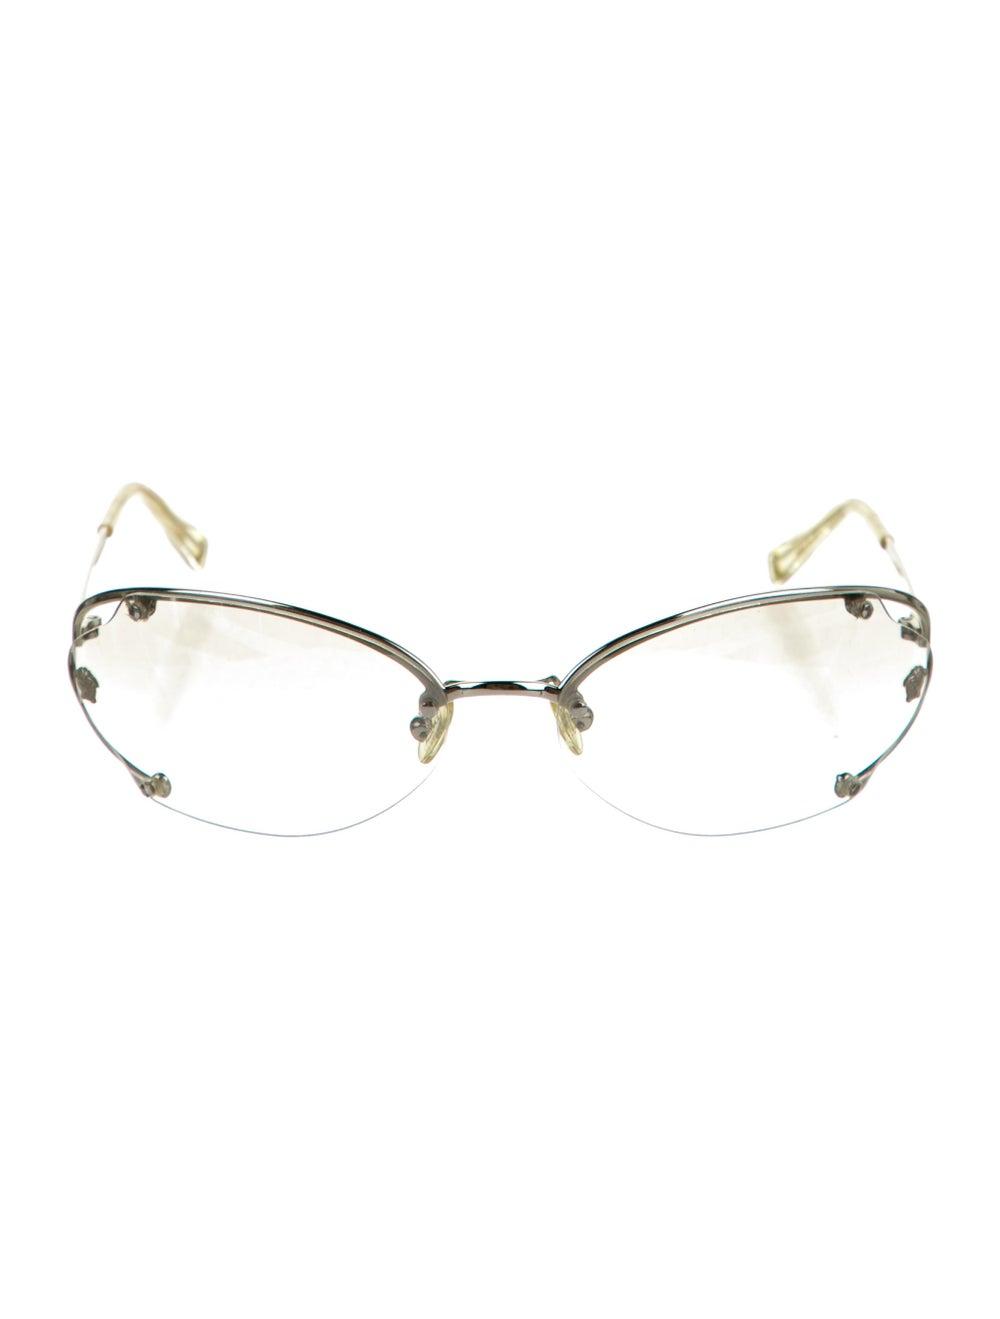 Versace Cat-Eye Mirrored Sunglasses Silver - image 1